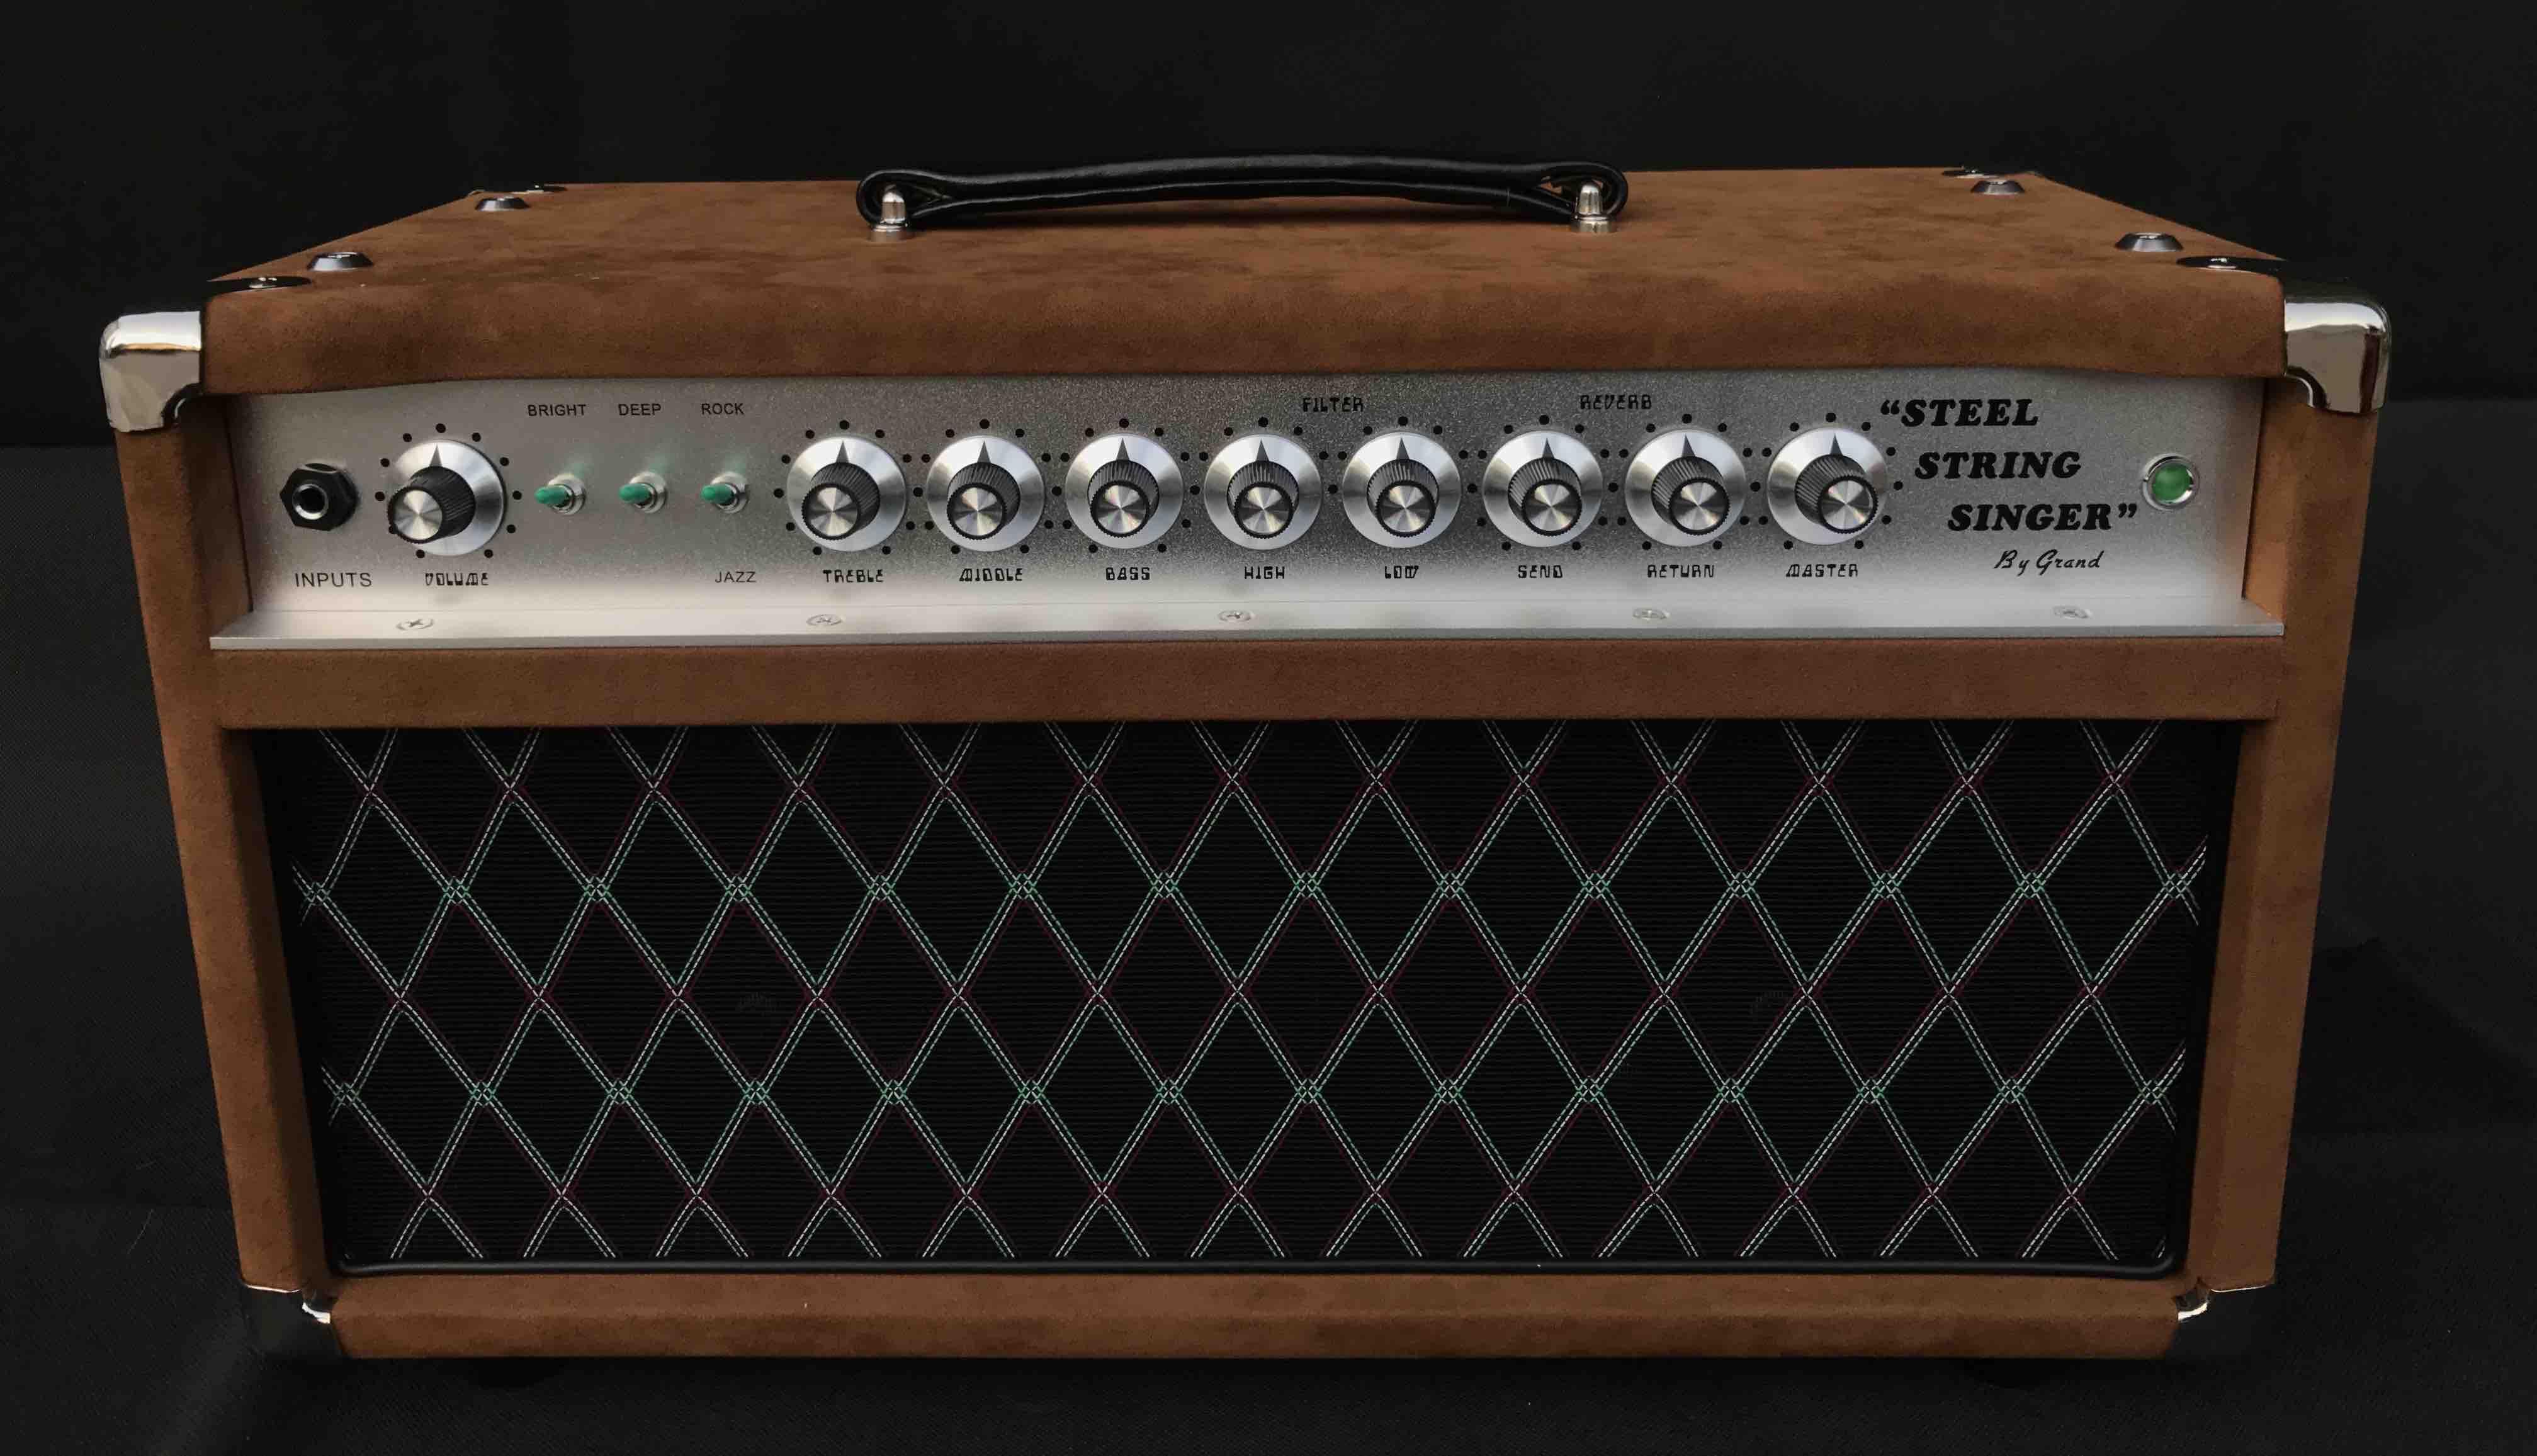 Professional Tube Guitar AMP Head 50W Dumble Tone SSS Steel String Singer Valve Amplifier in Brown